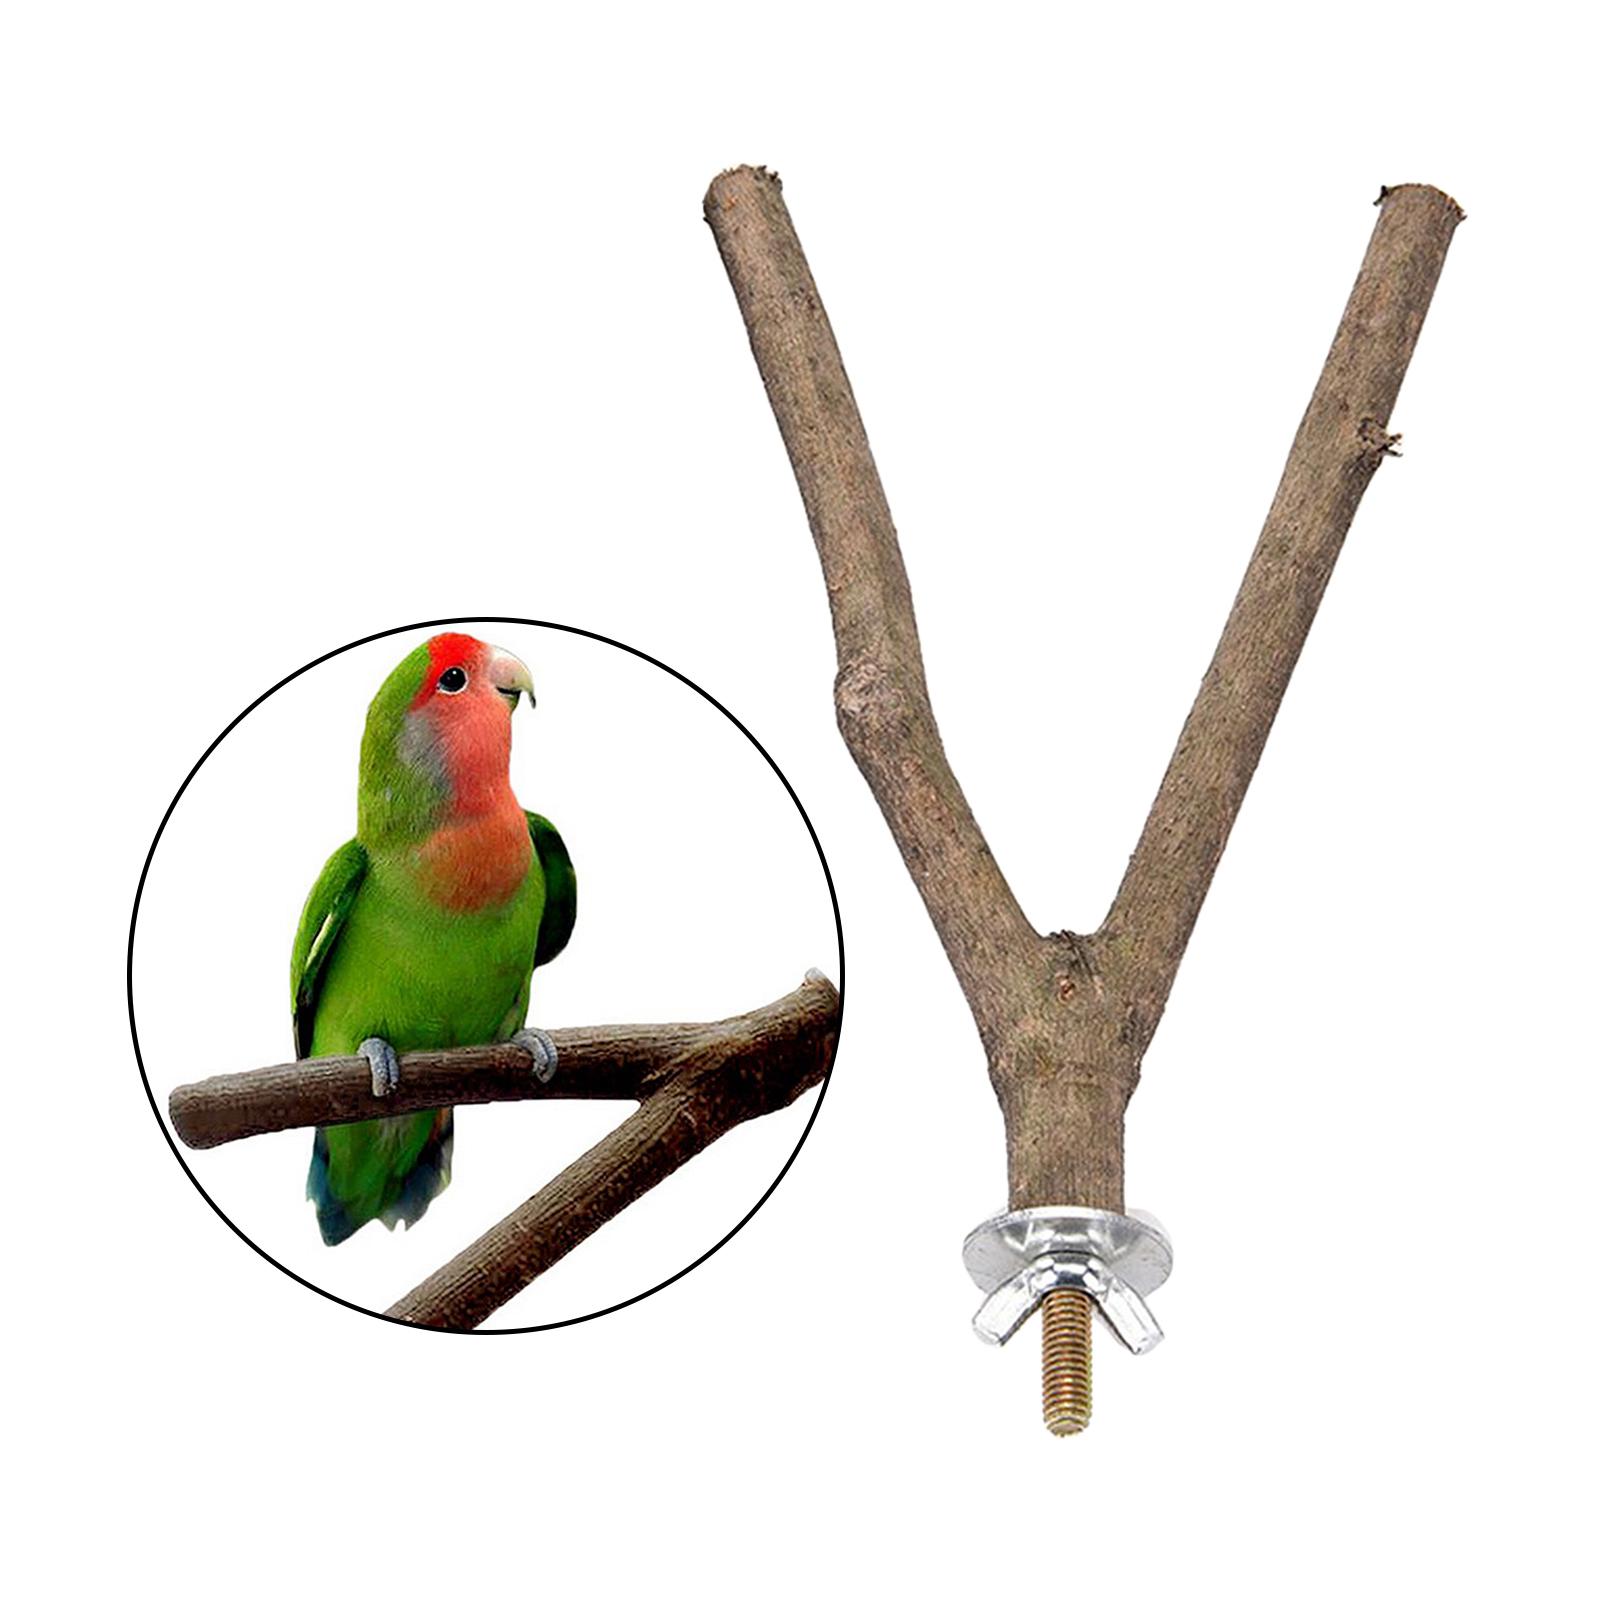 thumbnail 10 - Bird-Perch-Wood-Stand-Bird-Cage-Swing-Branch-for-Parrot-Parakeet-Cockatiel